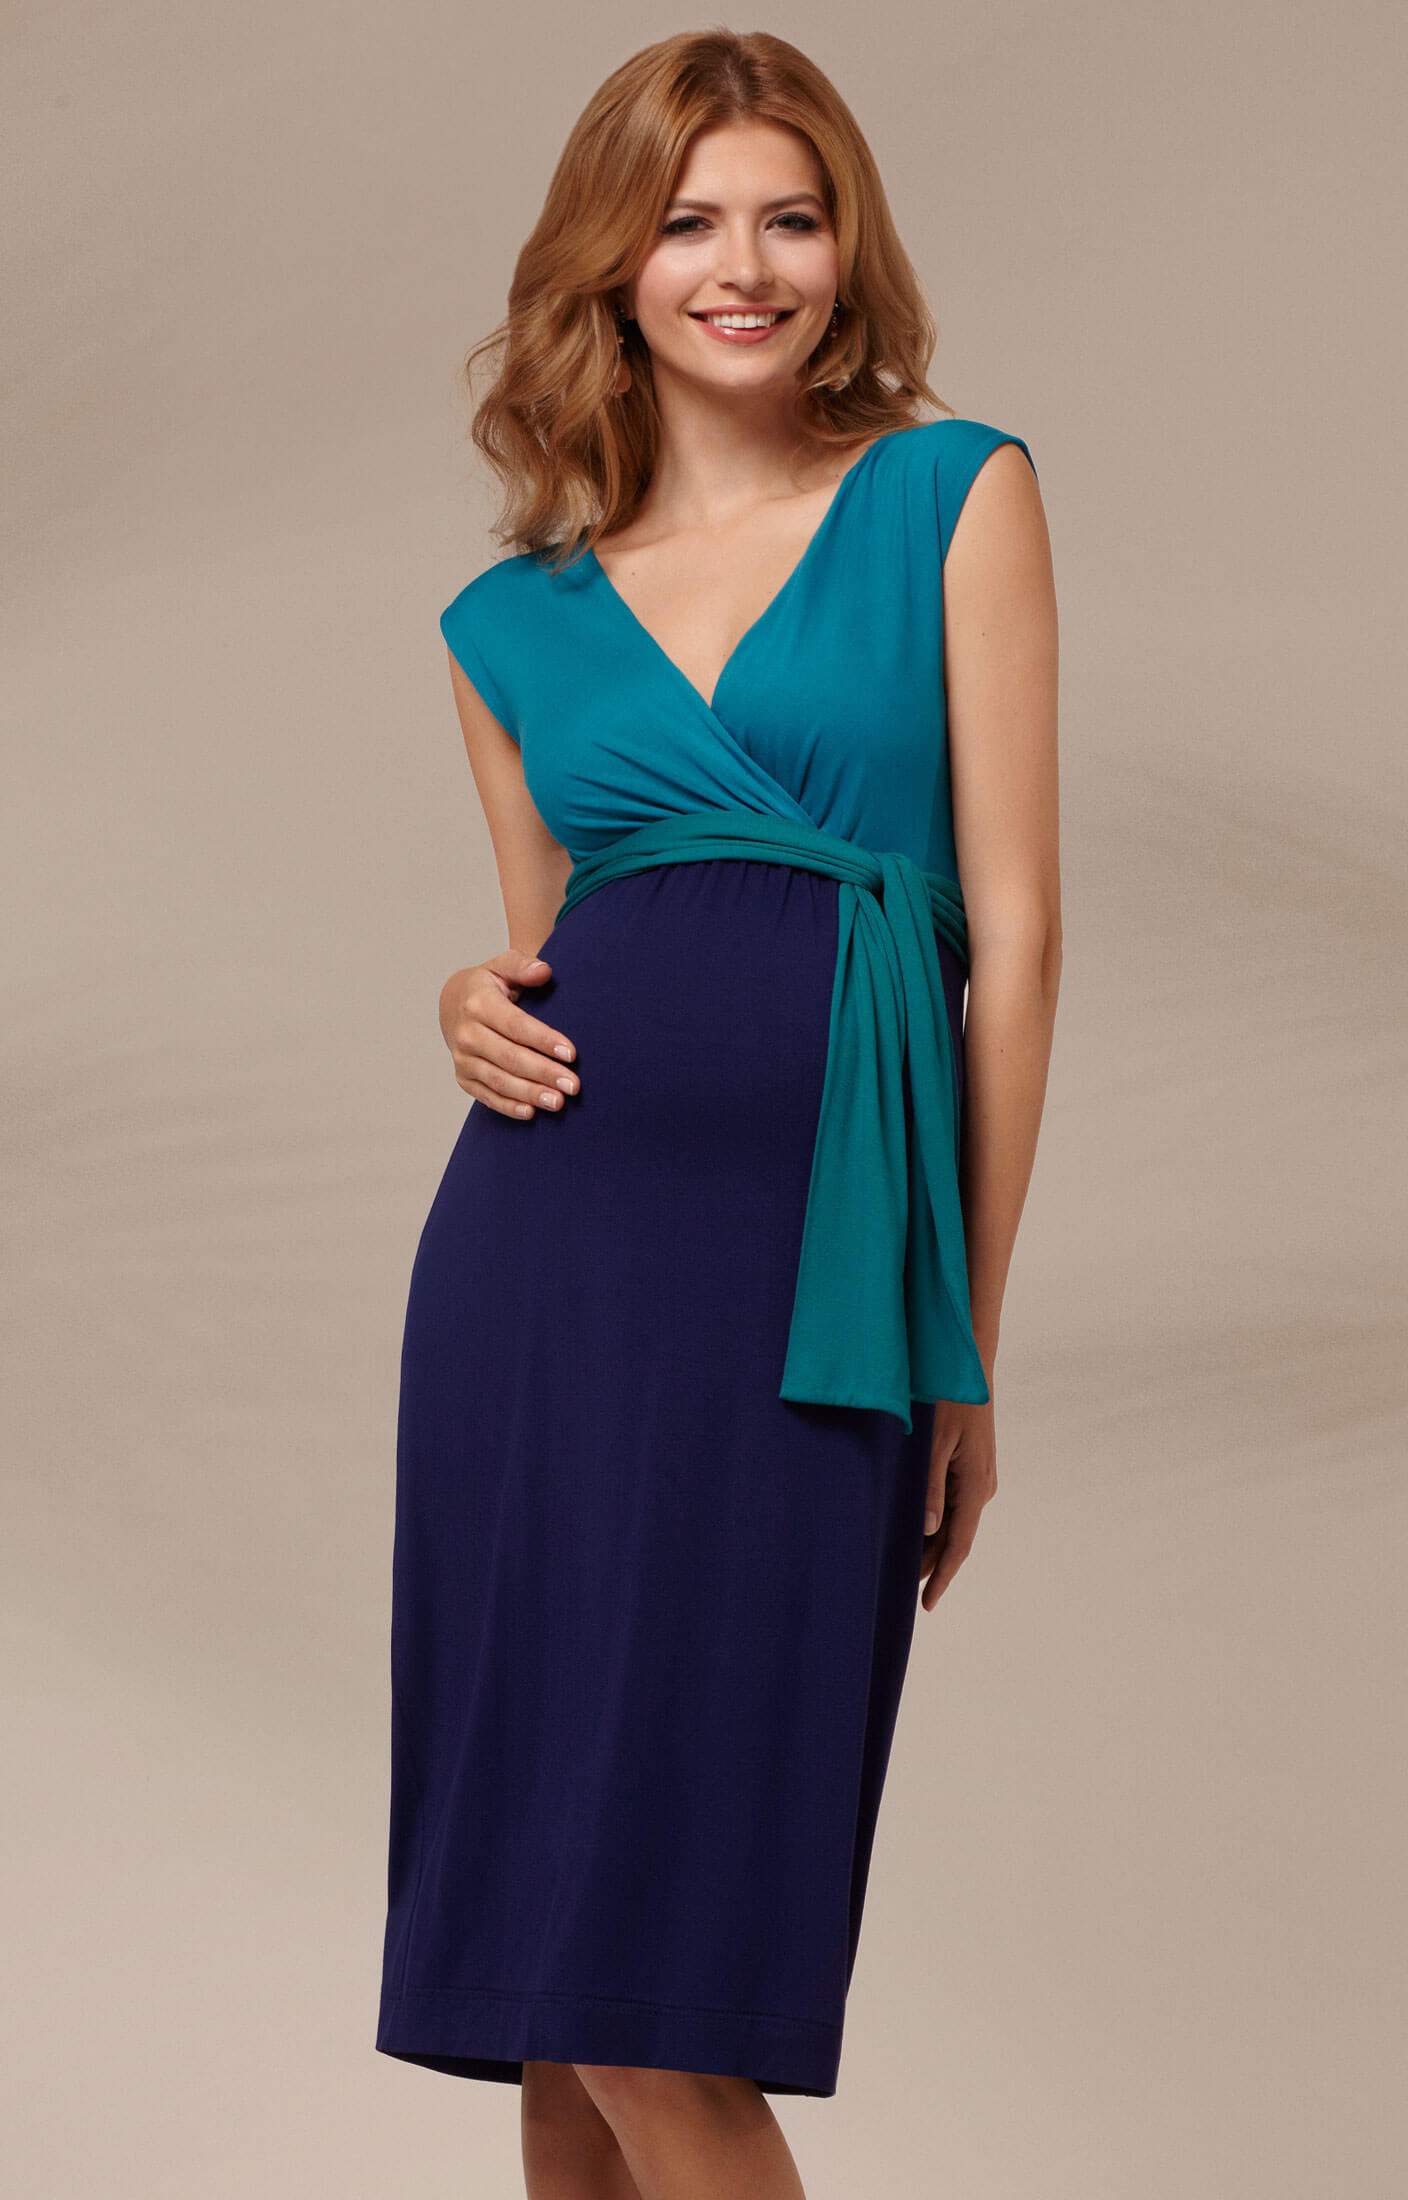 Jewel Colour-Block Umstandskleid in Biscay Blue ...